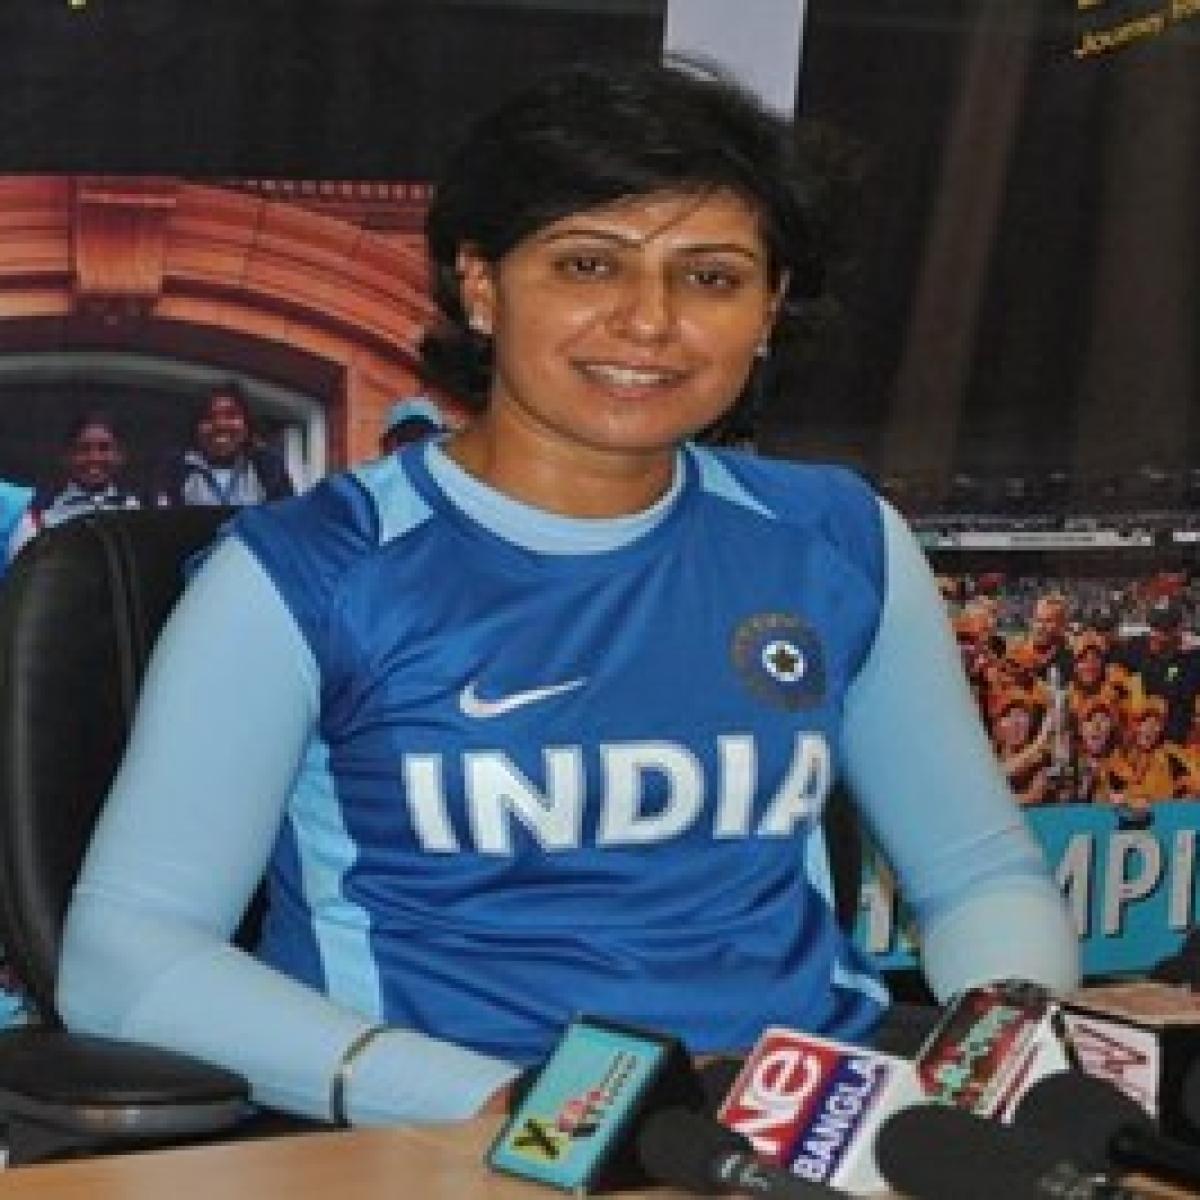 Cricket vs COVID-19: Former cricketers Anjum Chopra, Isa Guha and Lisa Sthalekar reiterate safety measures amid coronavirus outbreak